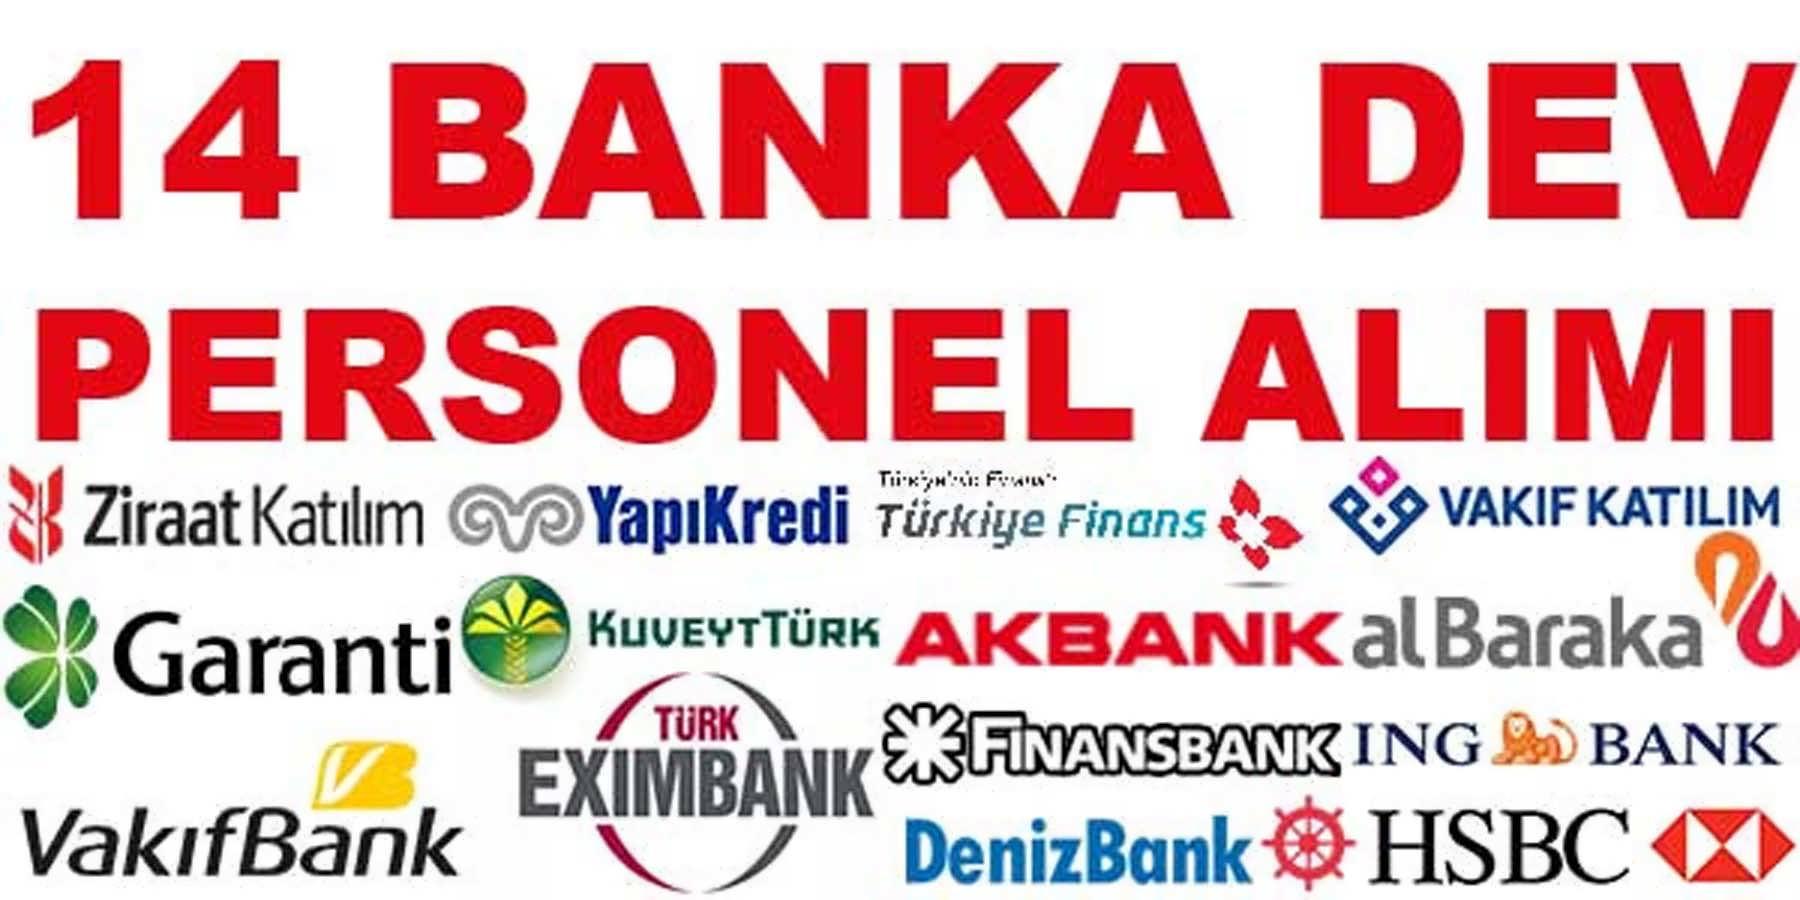 14 Banka Dev Personel Alımı Temmuz 2016